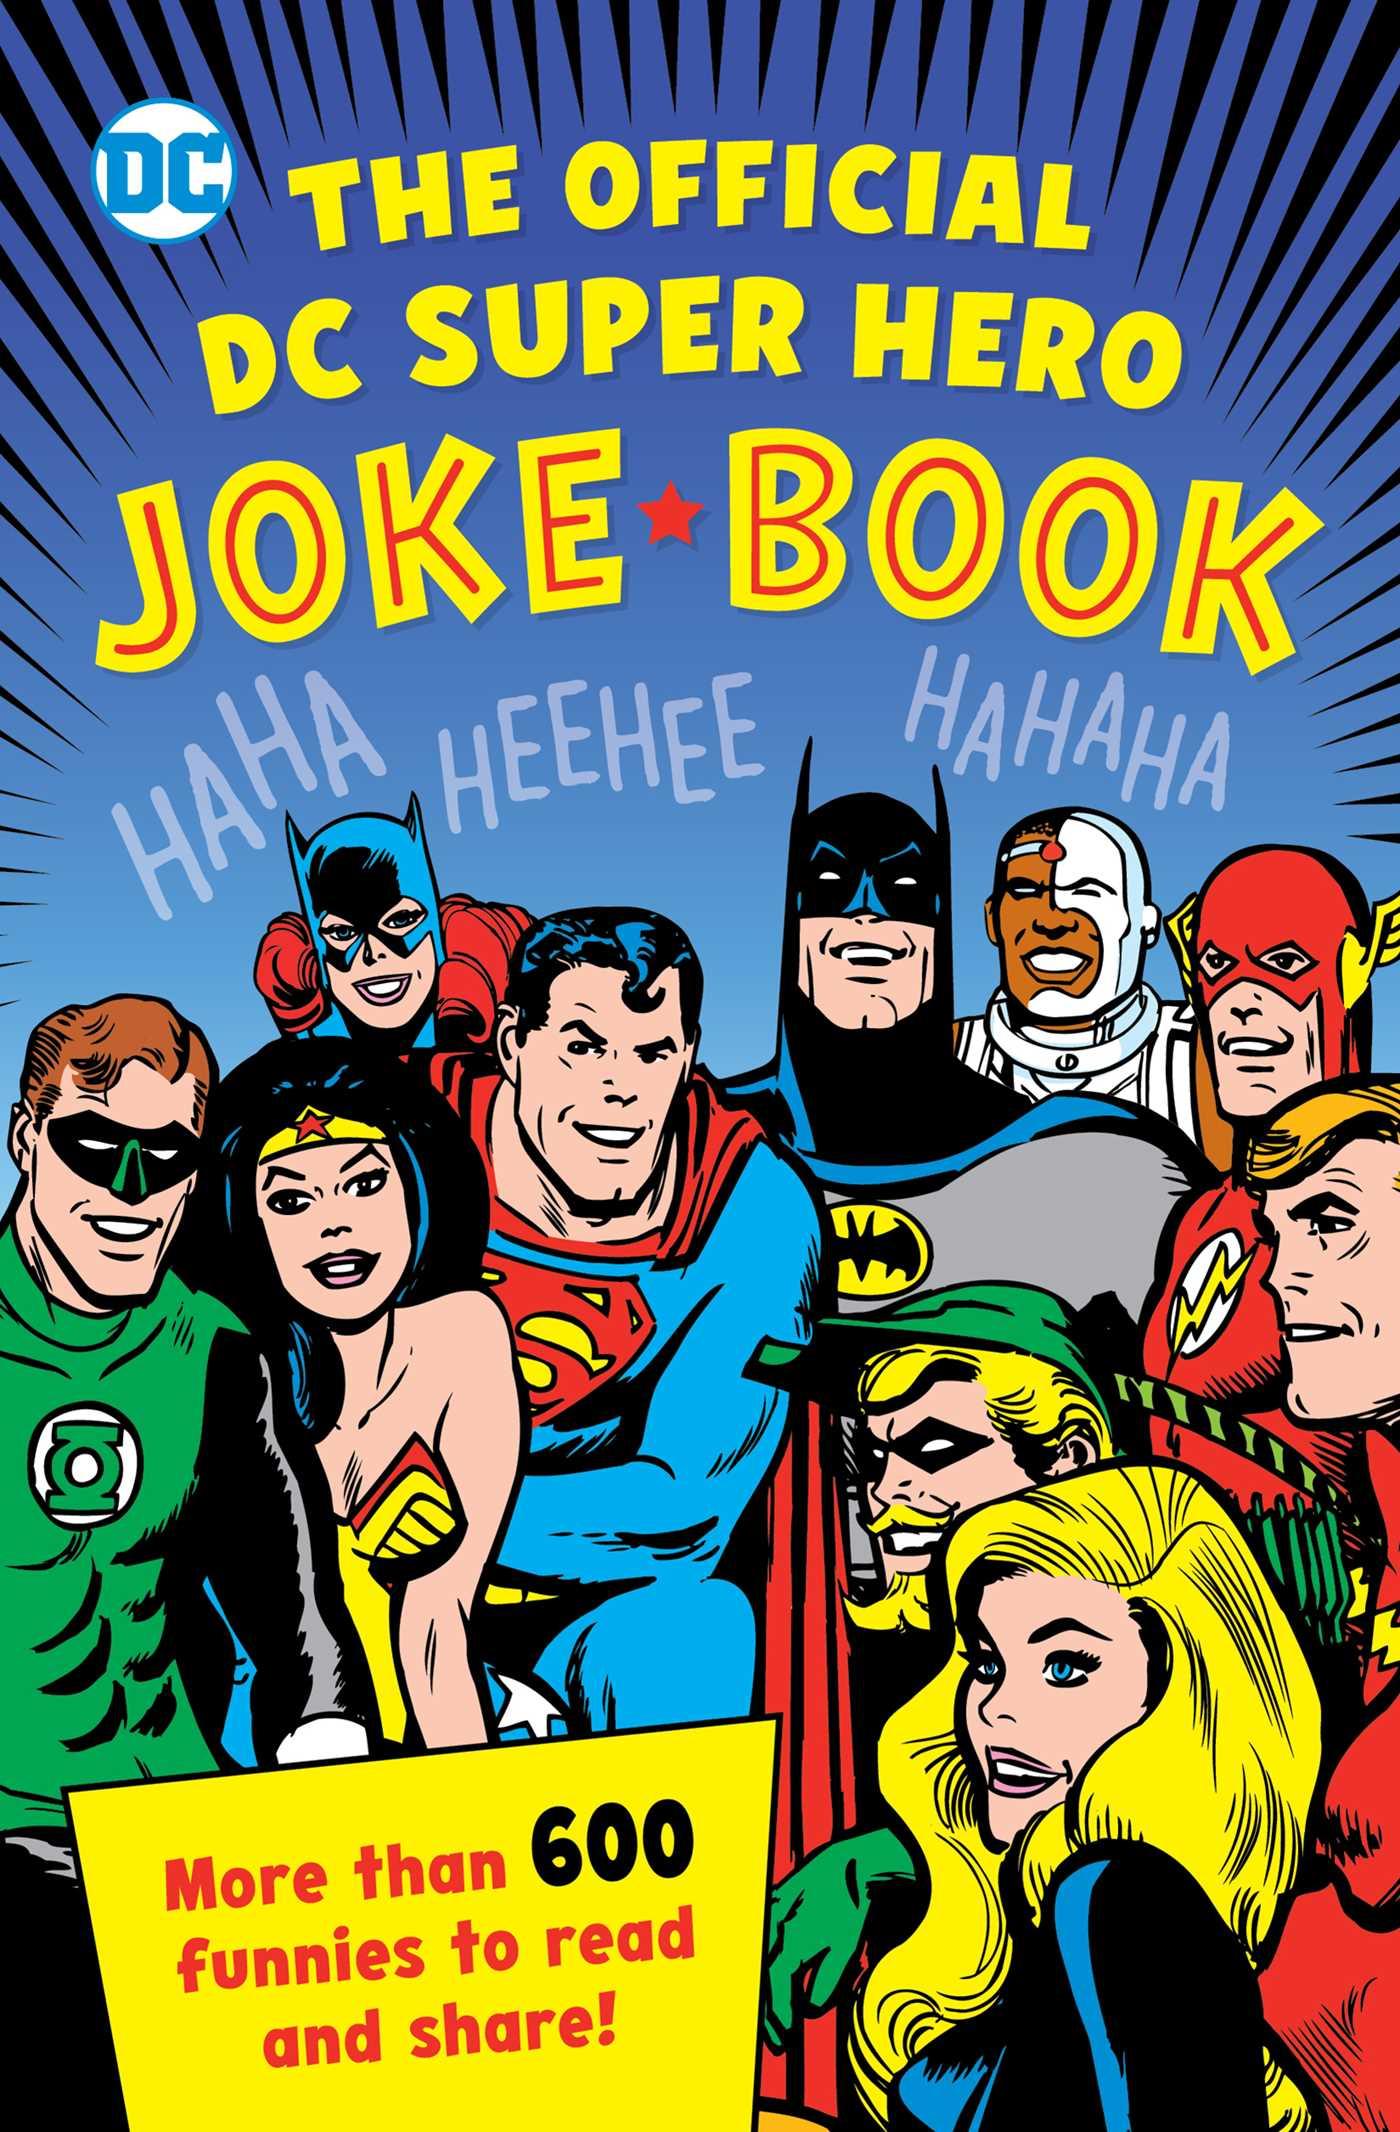 The official dc super hero joke book 9781941367339 hr